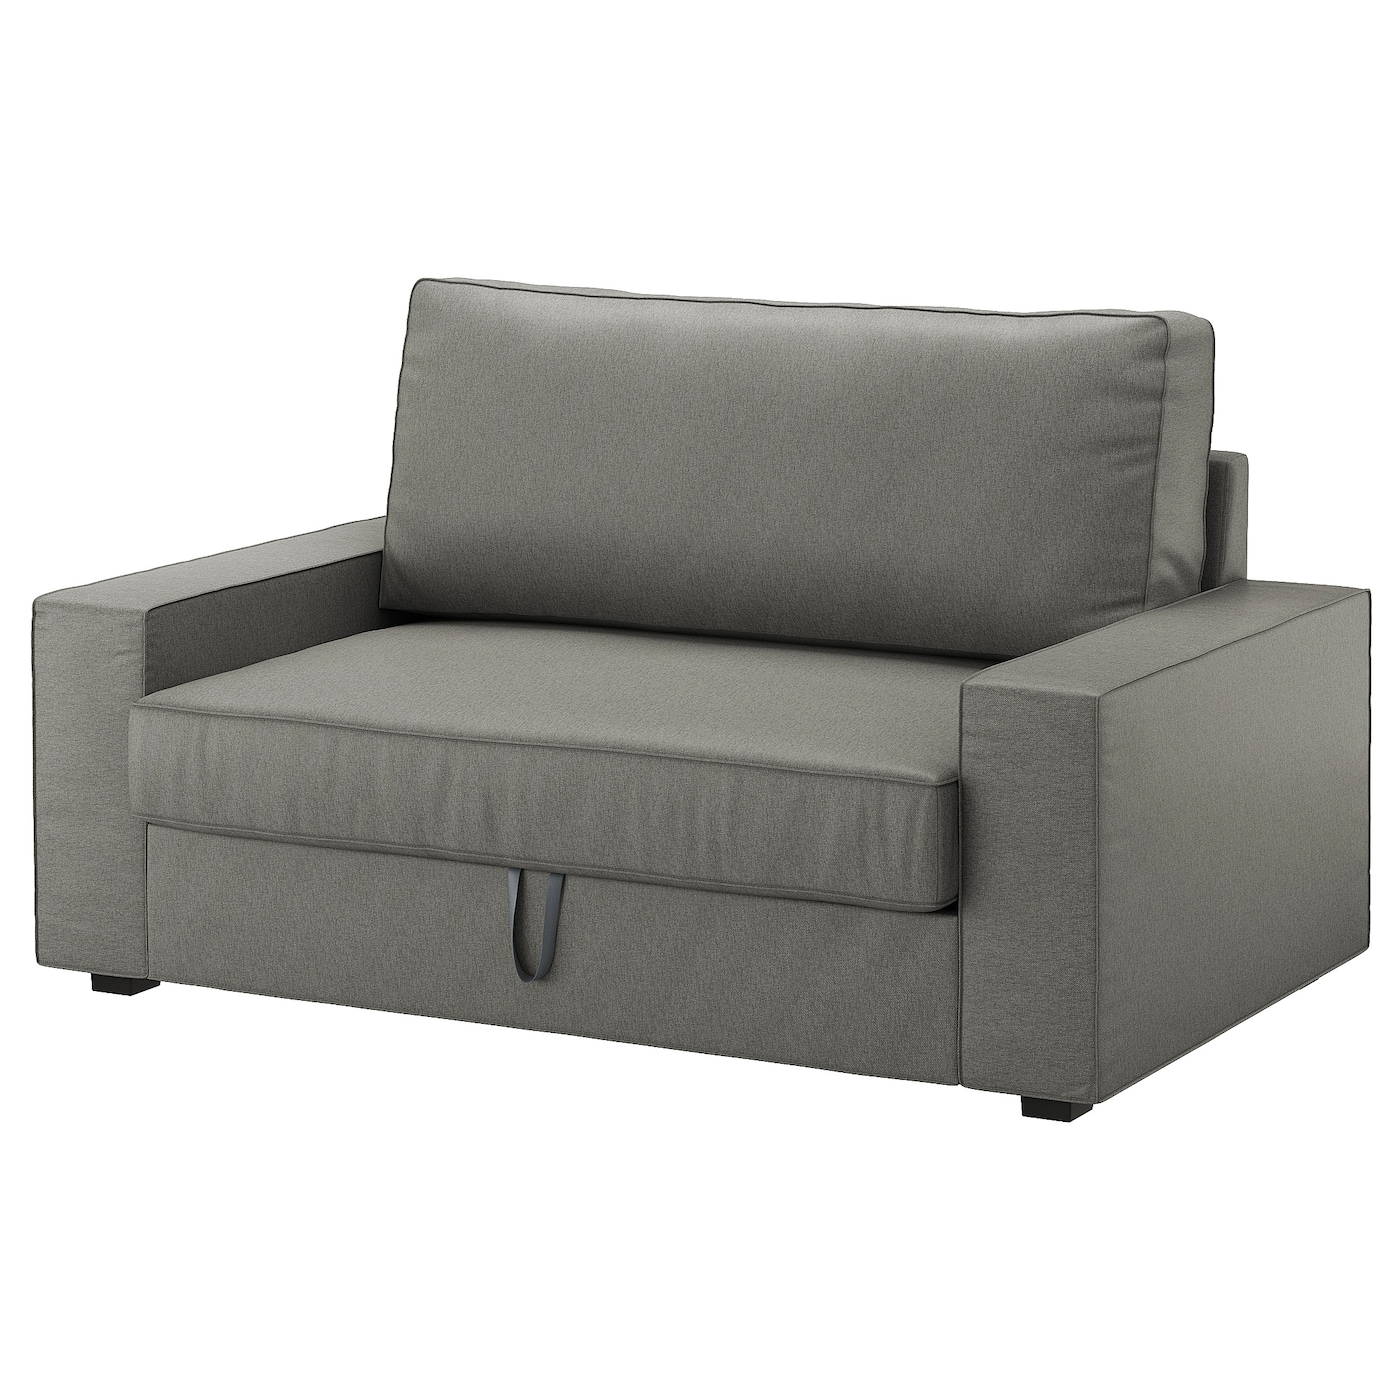 Vilasund two seat sofa bed borred grey green ikea ikea vilasund two seat sofa bed parisarafo Choice Image